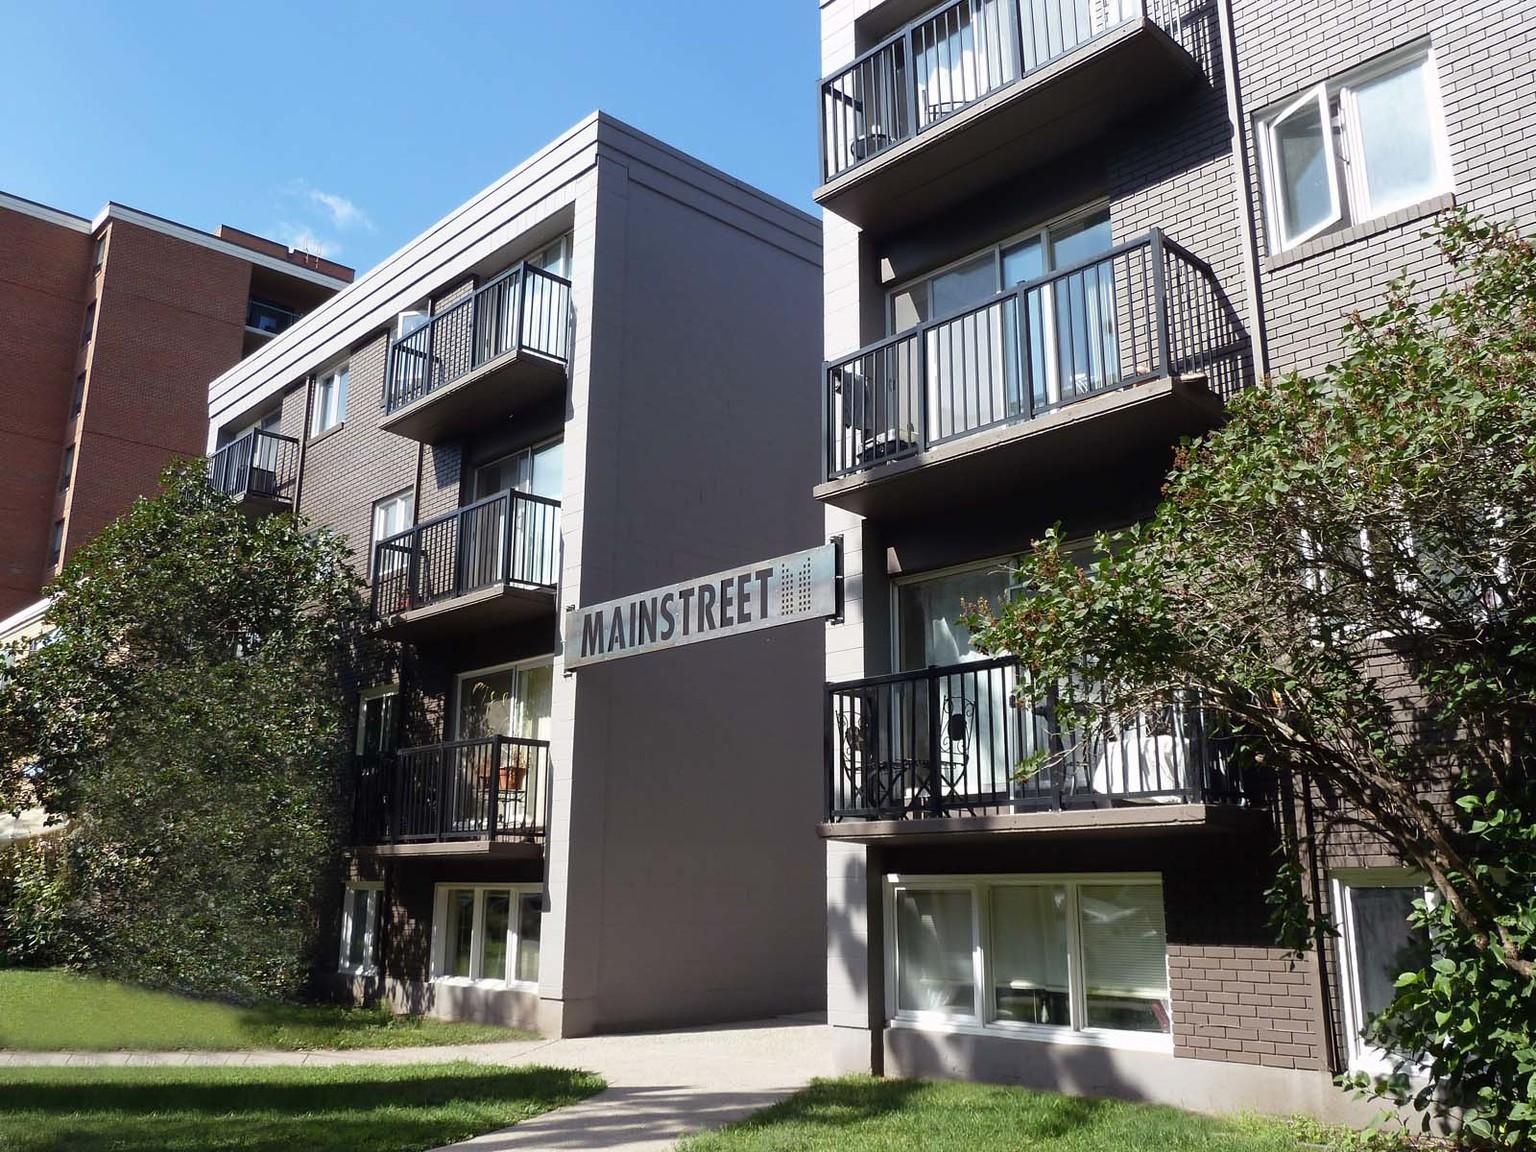 528 15 Ave SW, Calgary, AB - $875